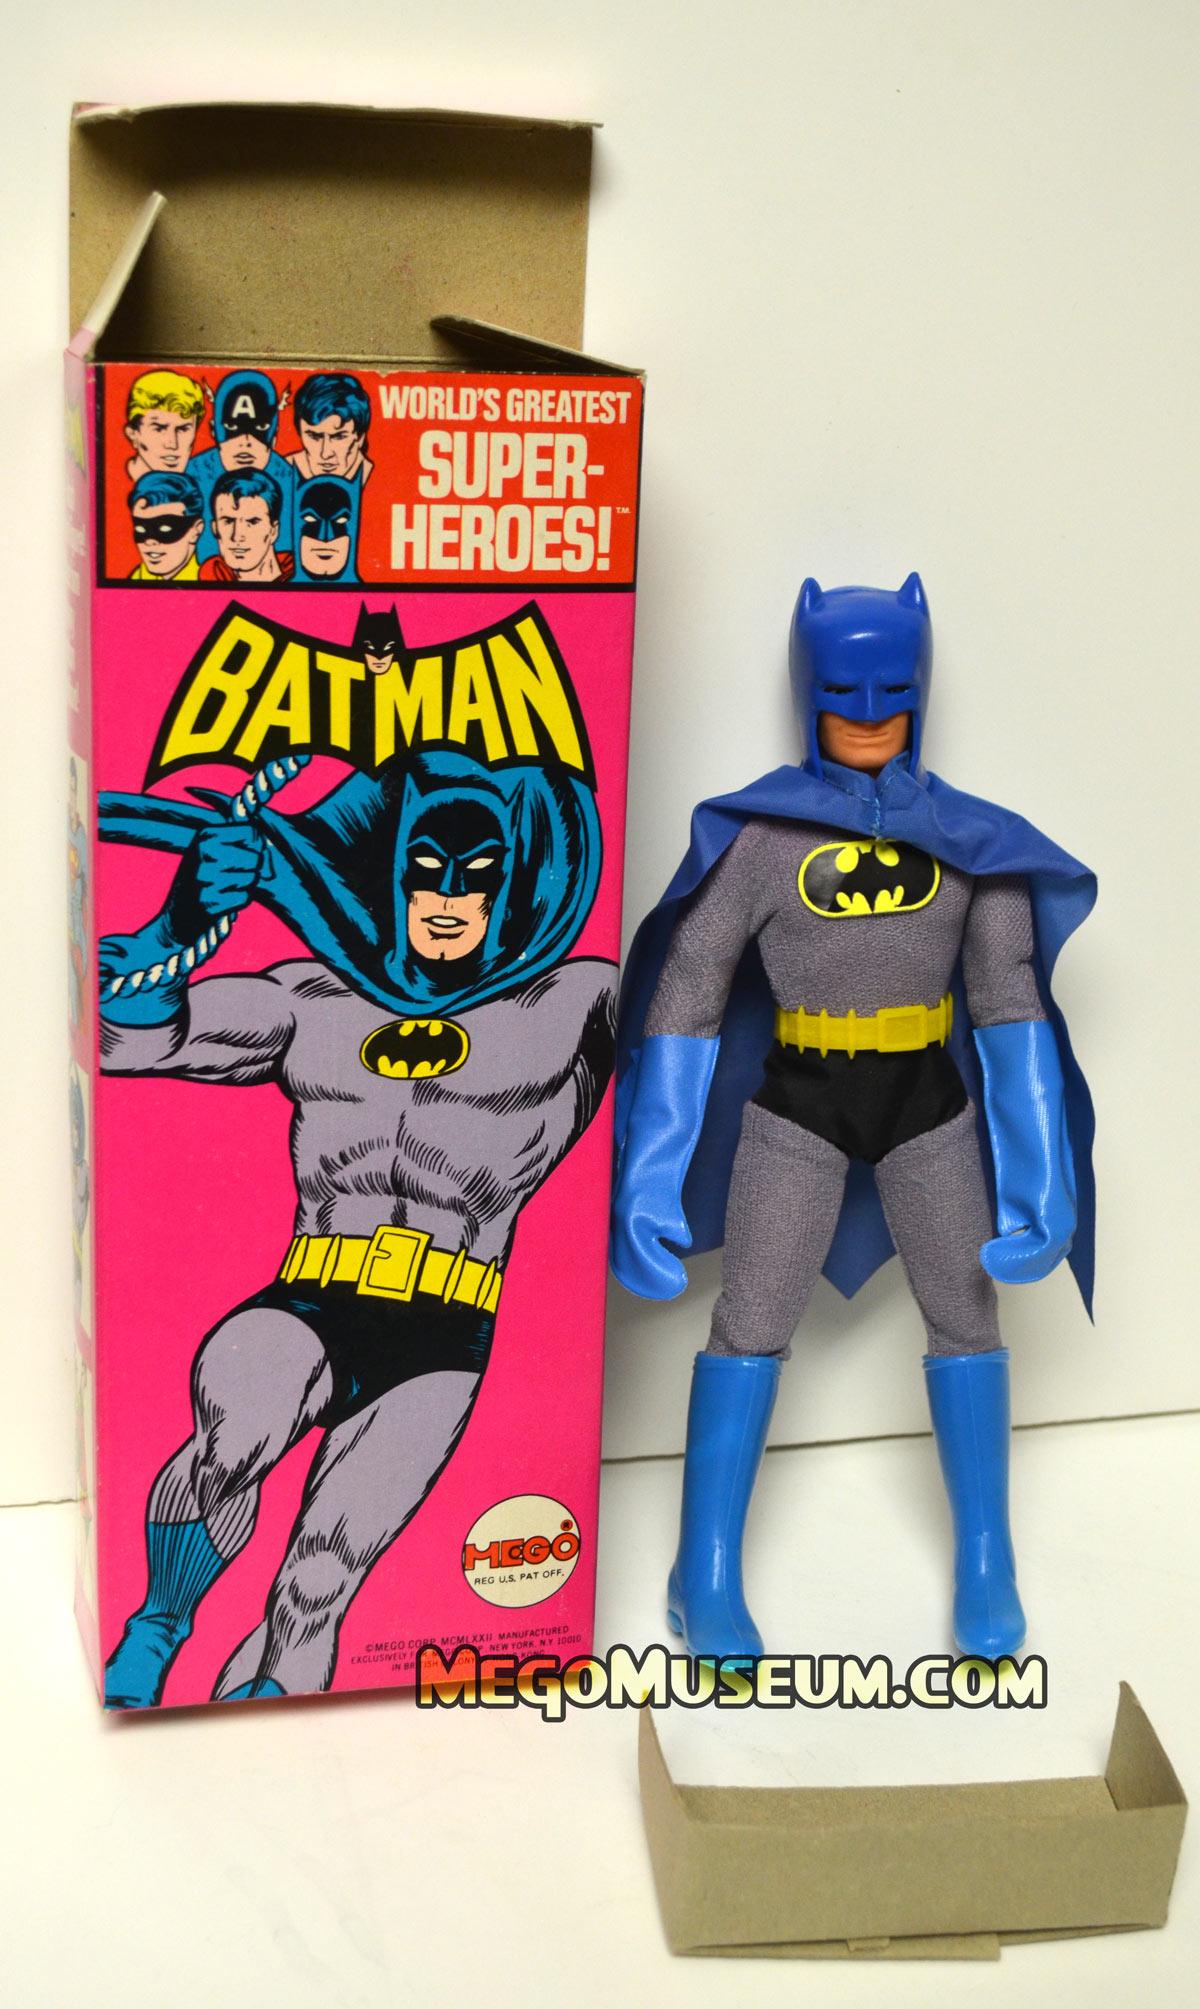 Mego Solid Boxed Batman (photo Courtesy of Mark Huckabone)